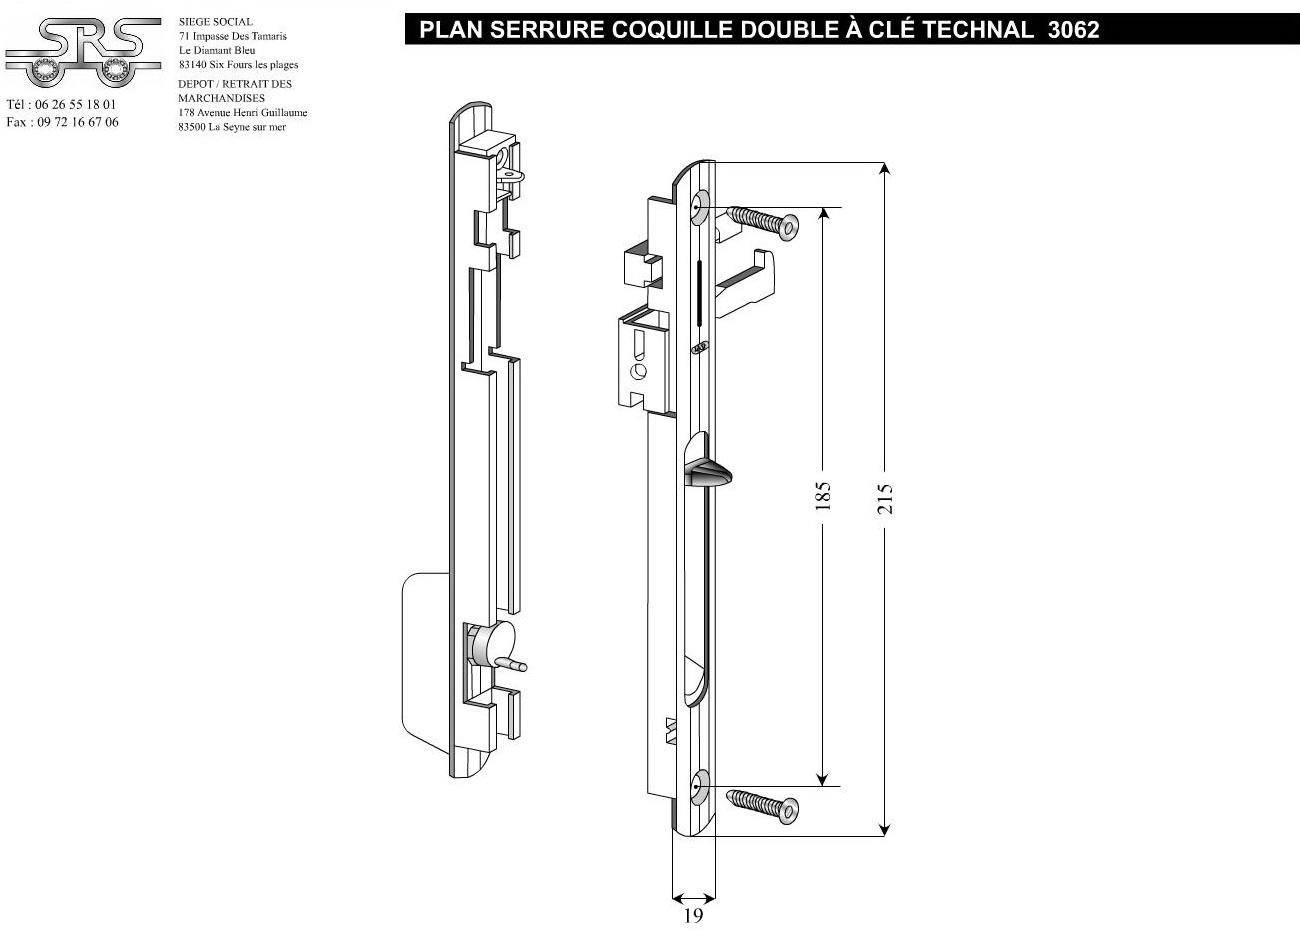 serrure baie vitr e coulissante technal r f 3062gris. Black Bedroom Furniture Sets. Home Design Ideas